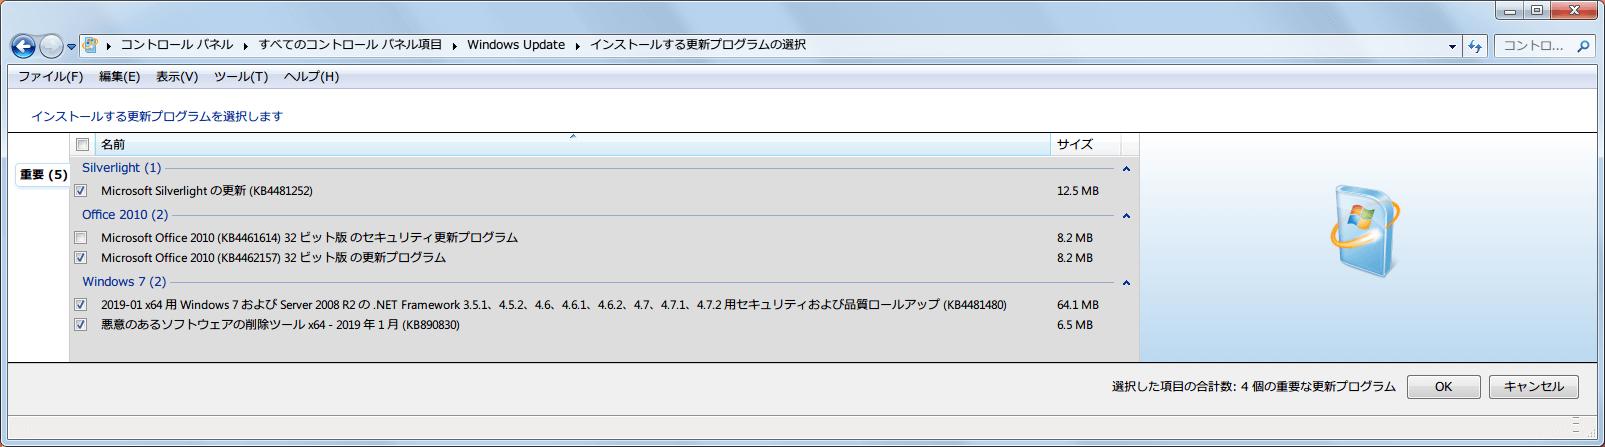 Windows 7 64bit Windows Update 重要 2019年1月公開分更新プログラム(重要)インストール